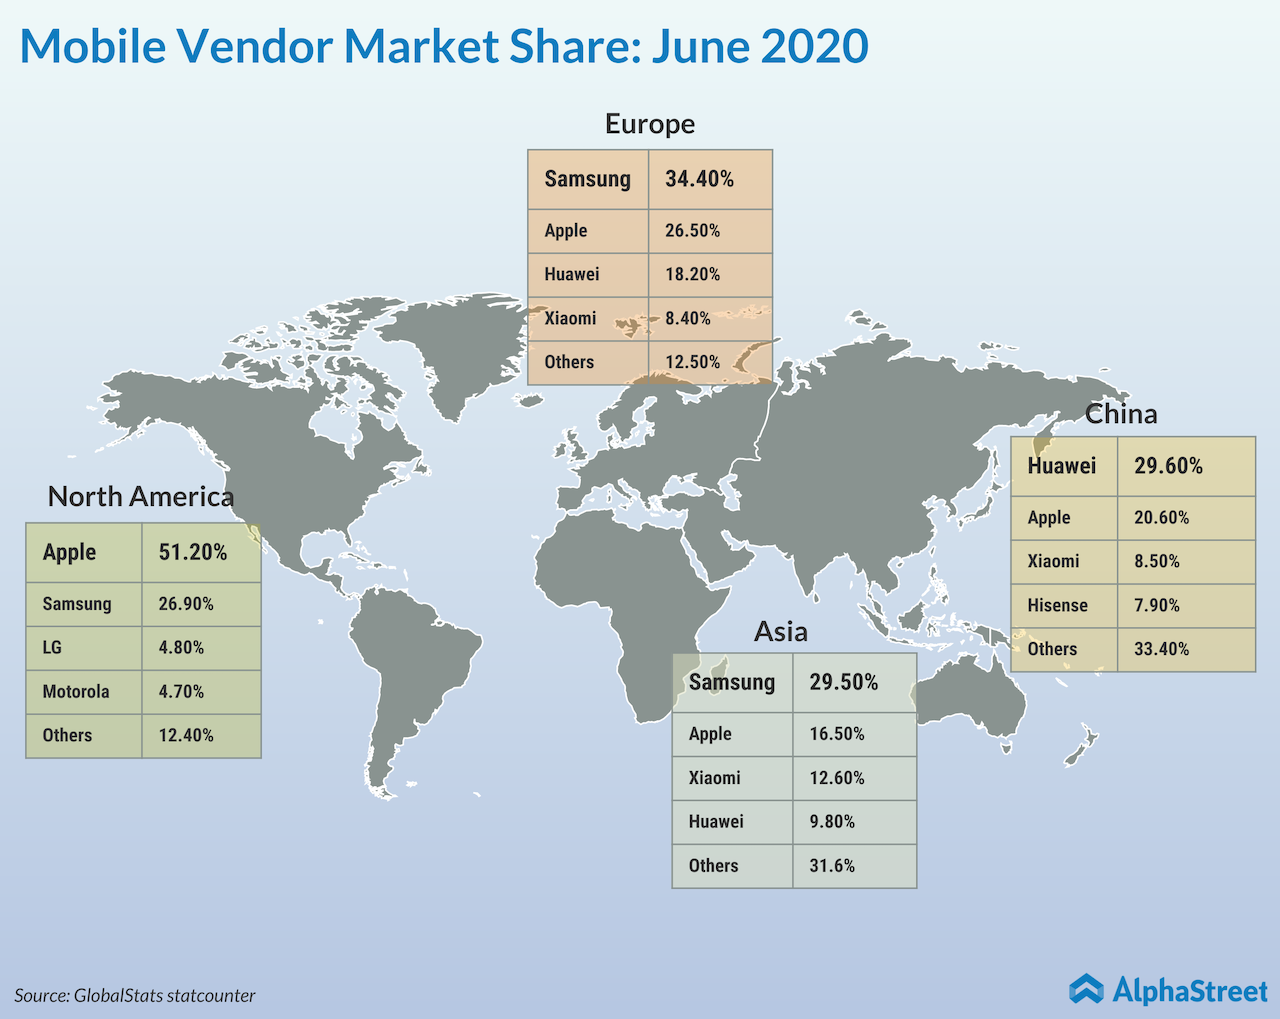 Mobile vendor market share